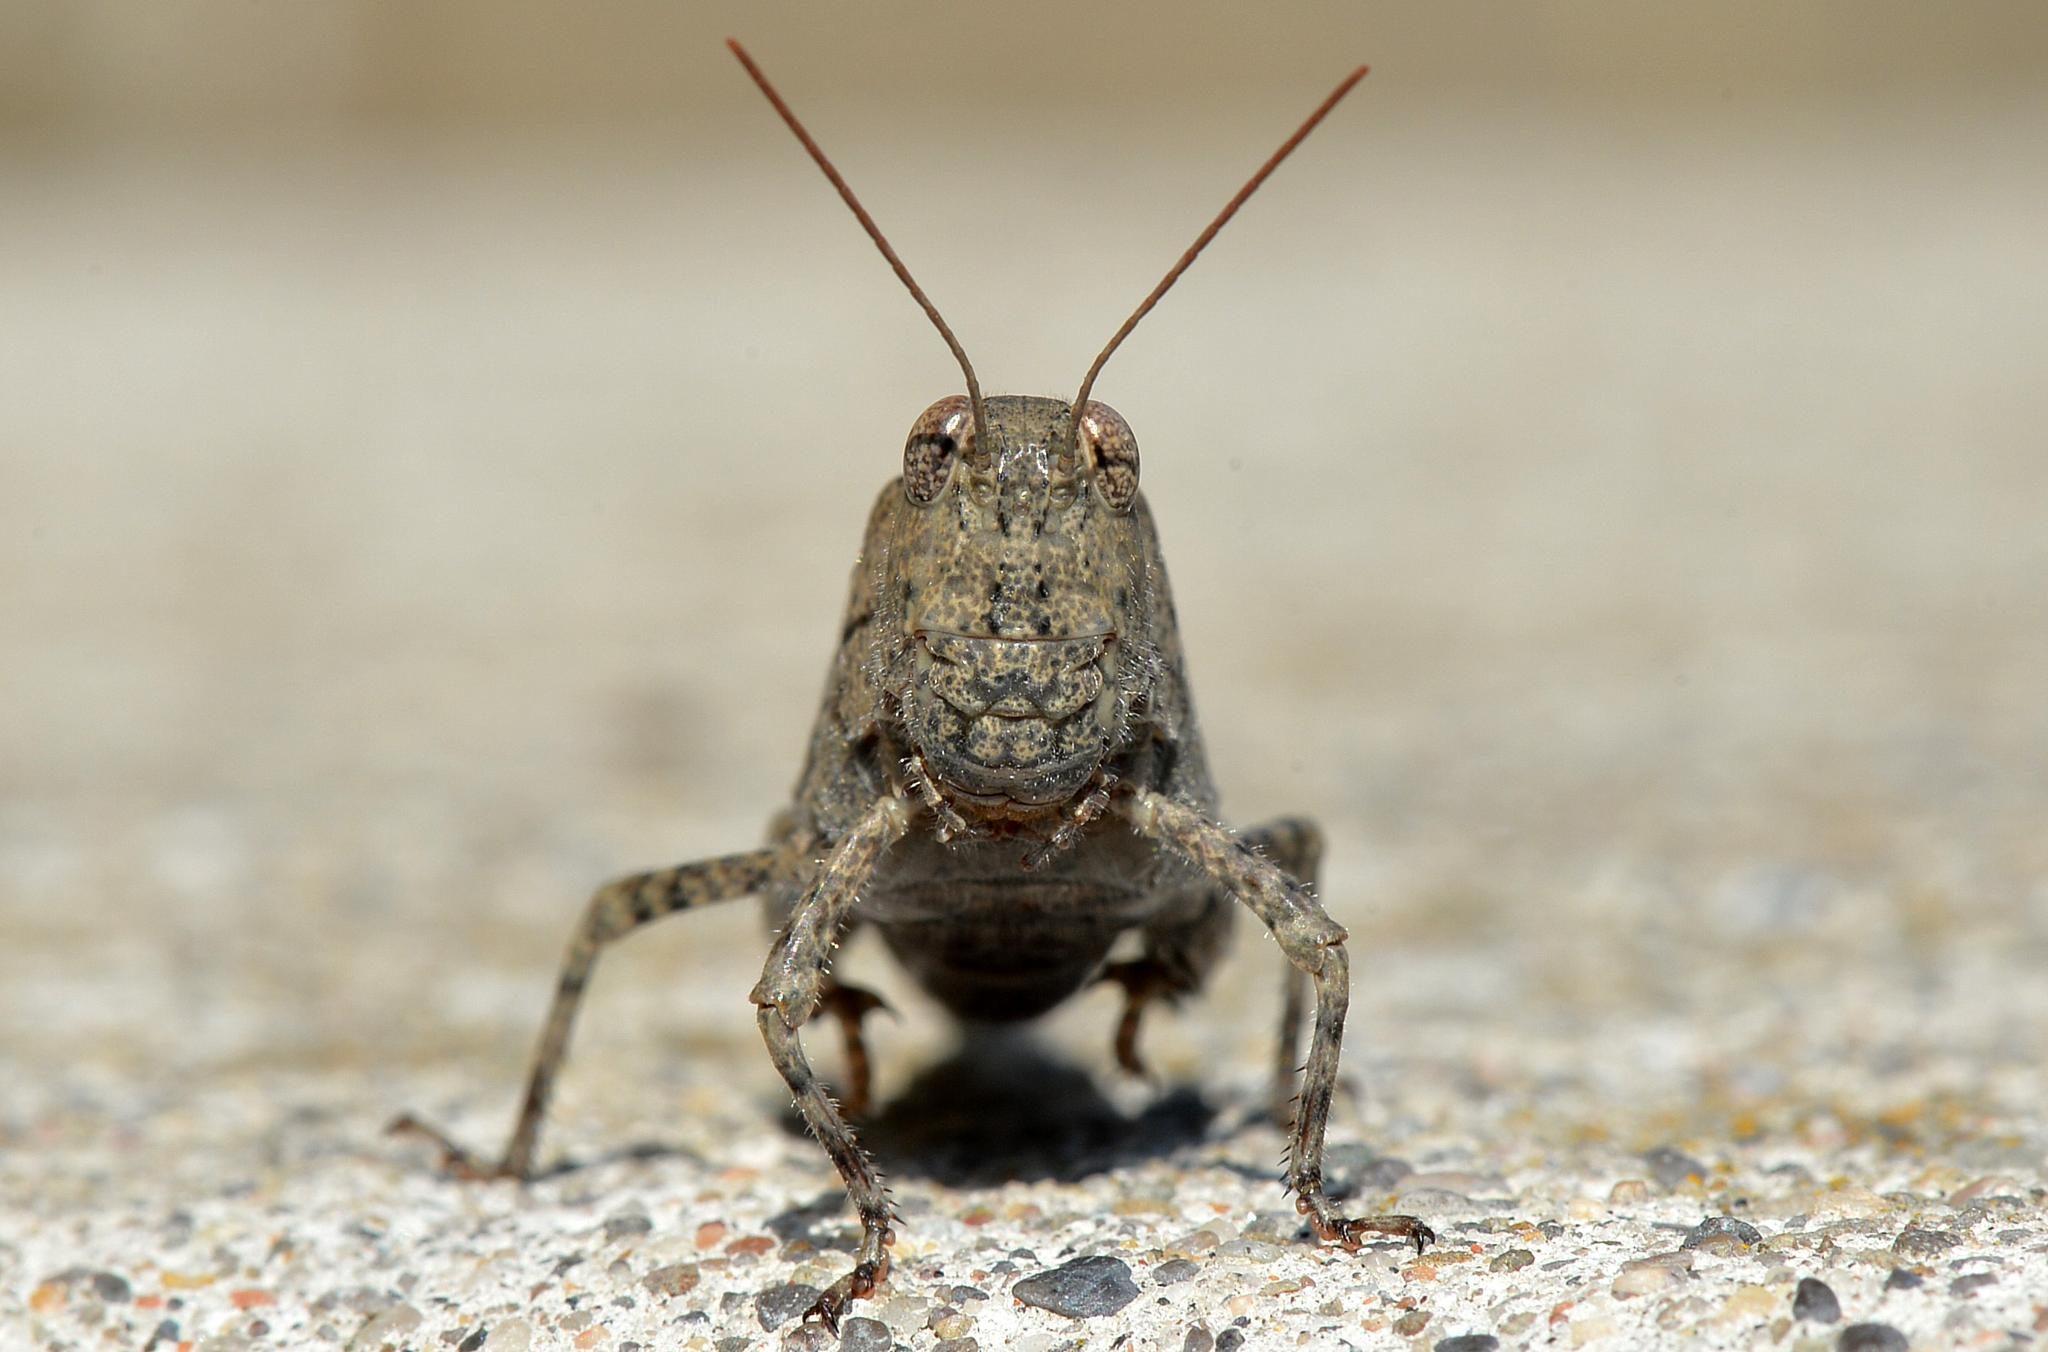 Grasshopper by David Lam